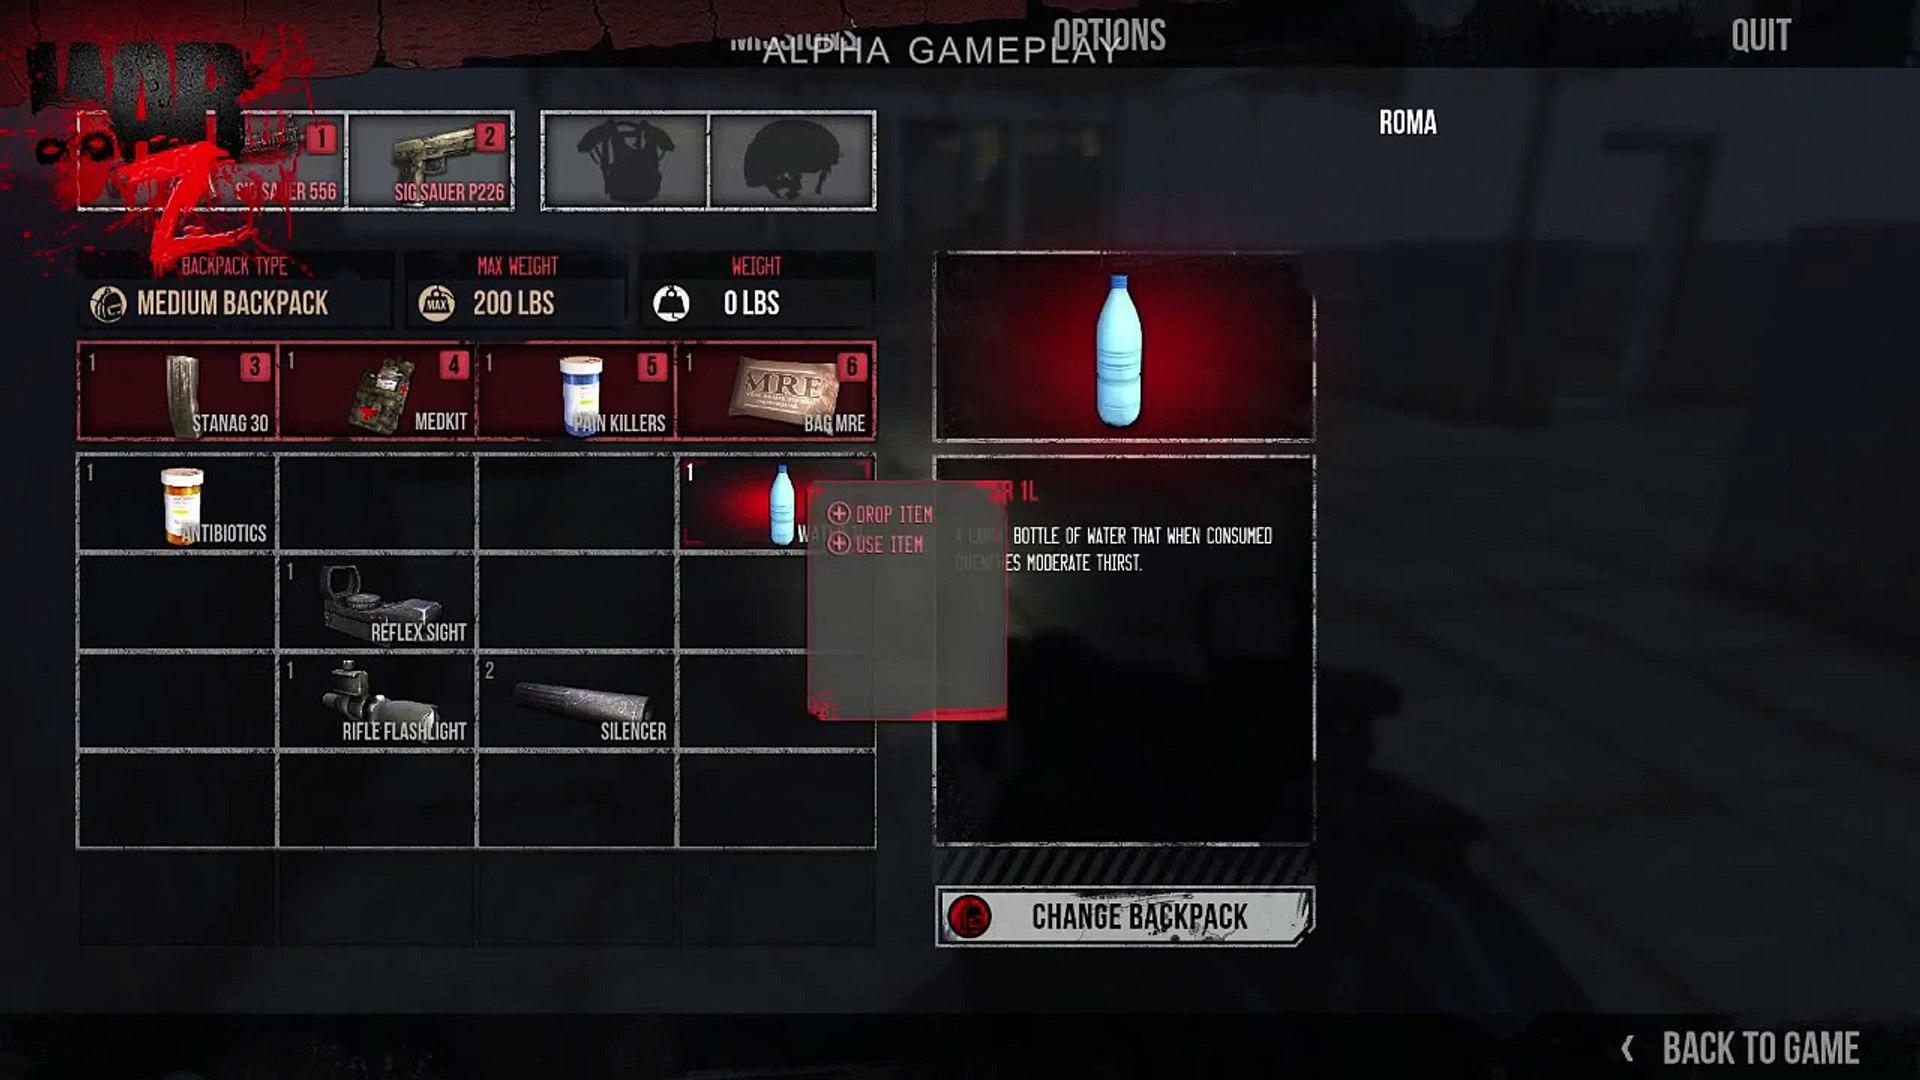 Extrait / Gameplay - The War Z (Alpha Gameplay Demonstration)